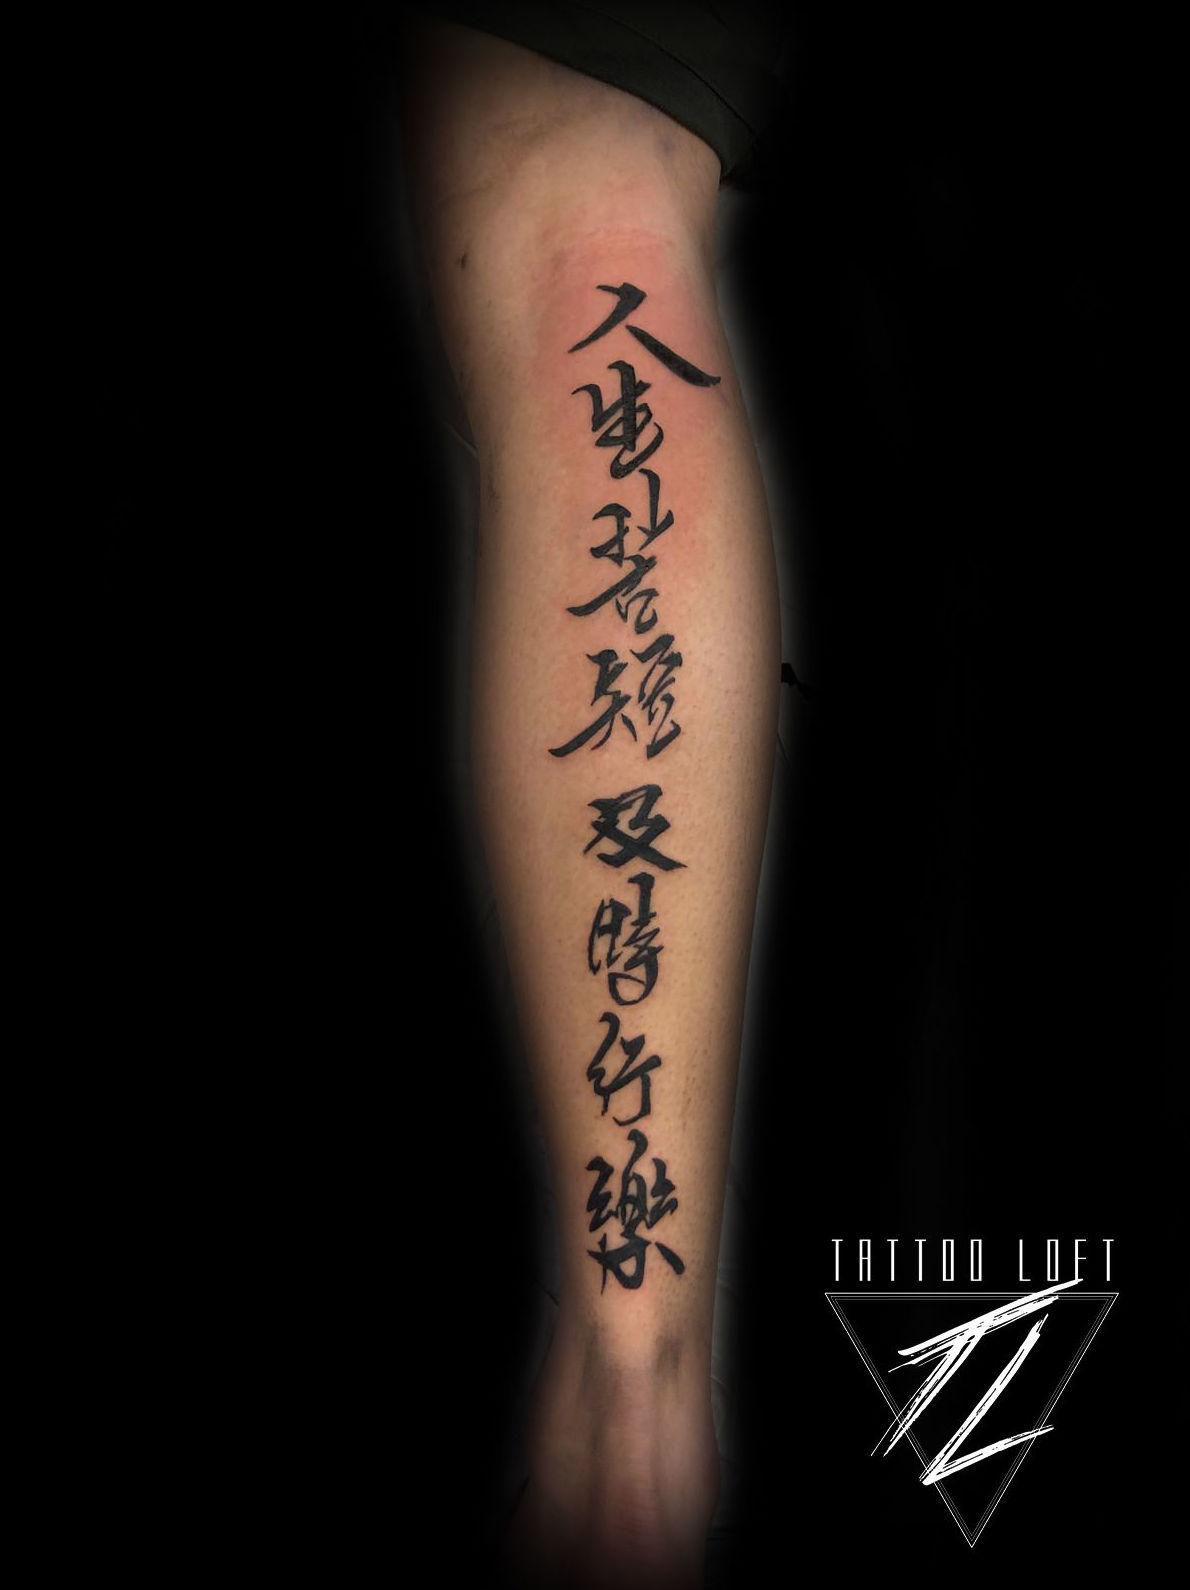 Foto 75 de Estudio artístico de tatuaje en  | Tattoo Loft